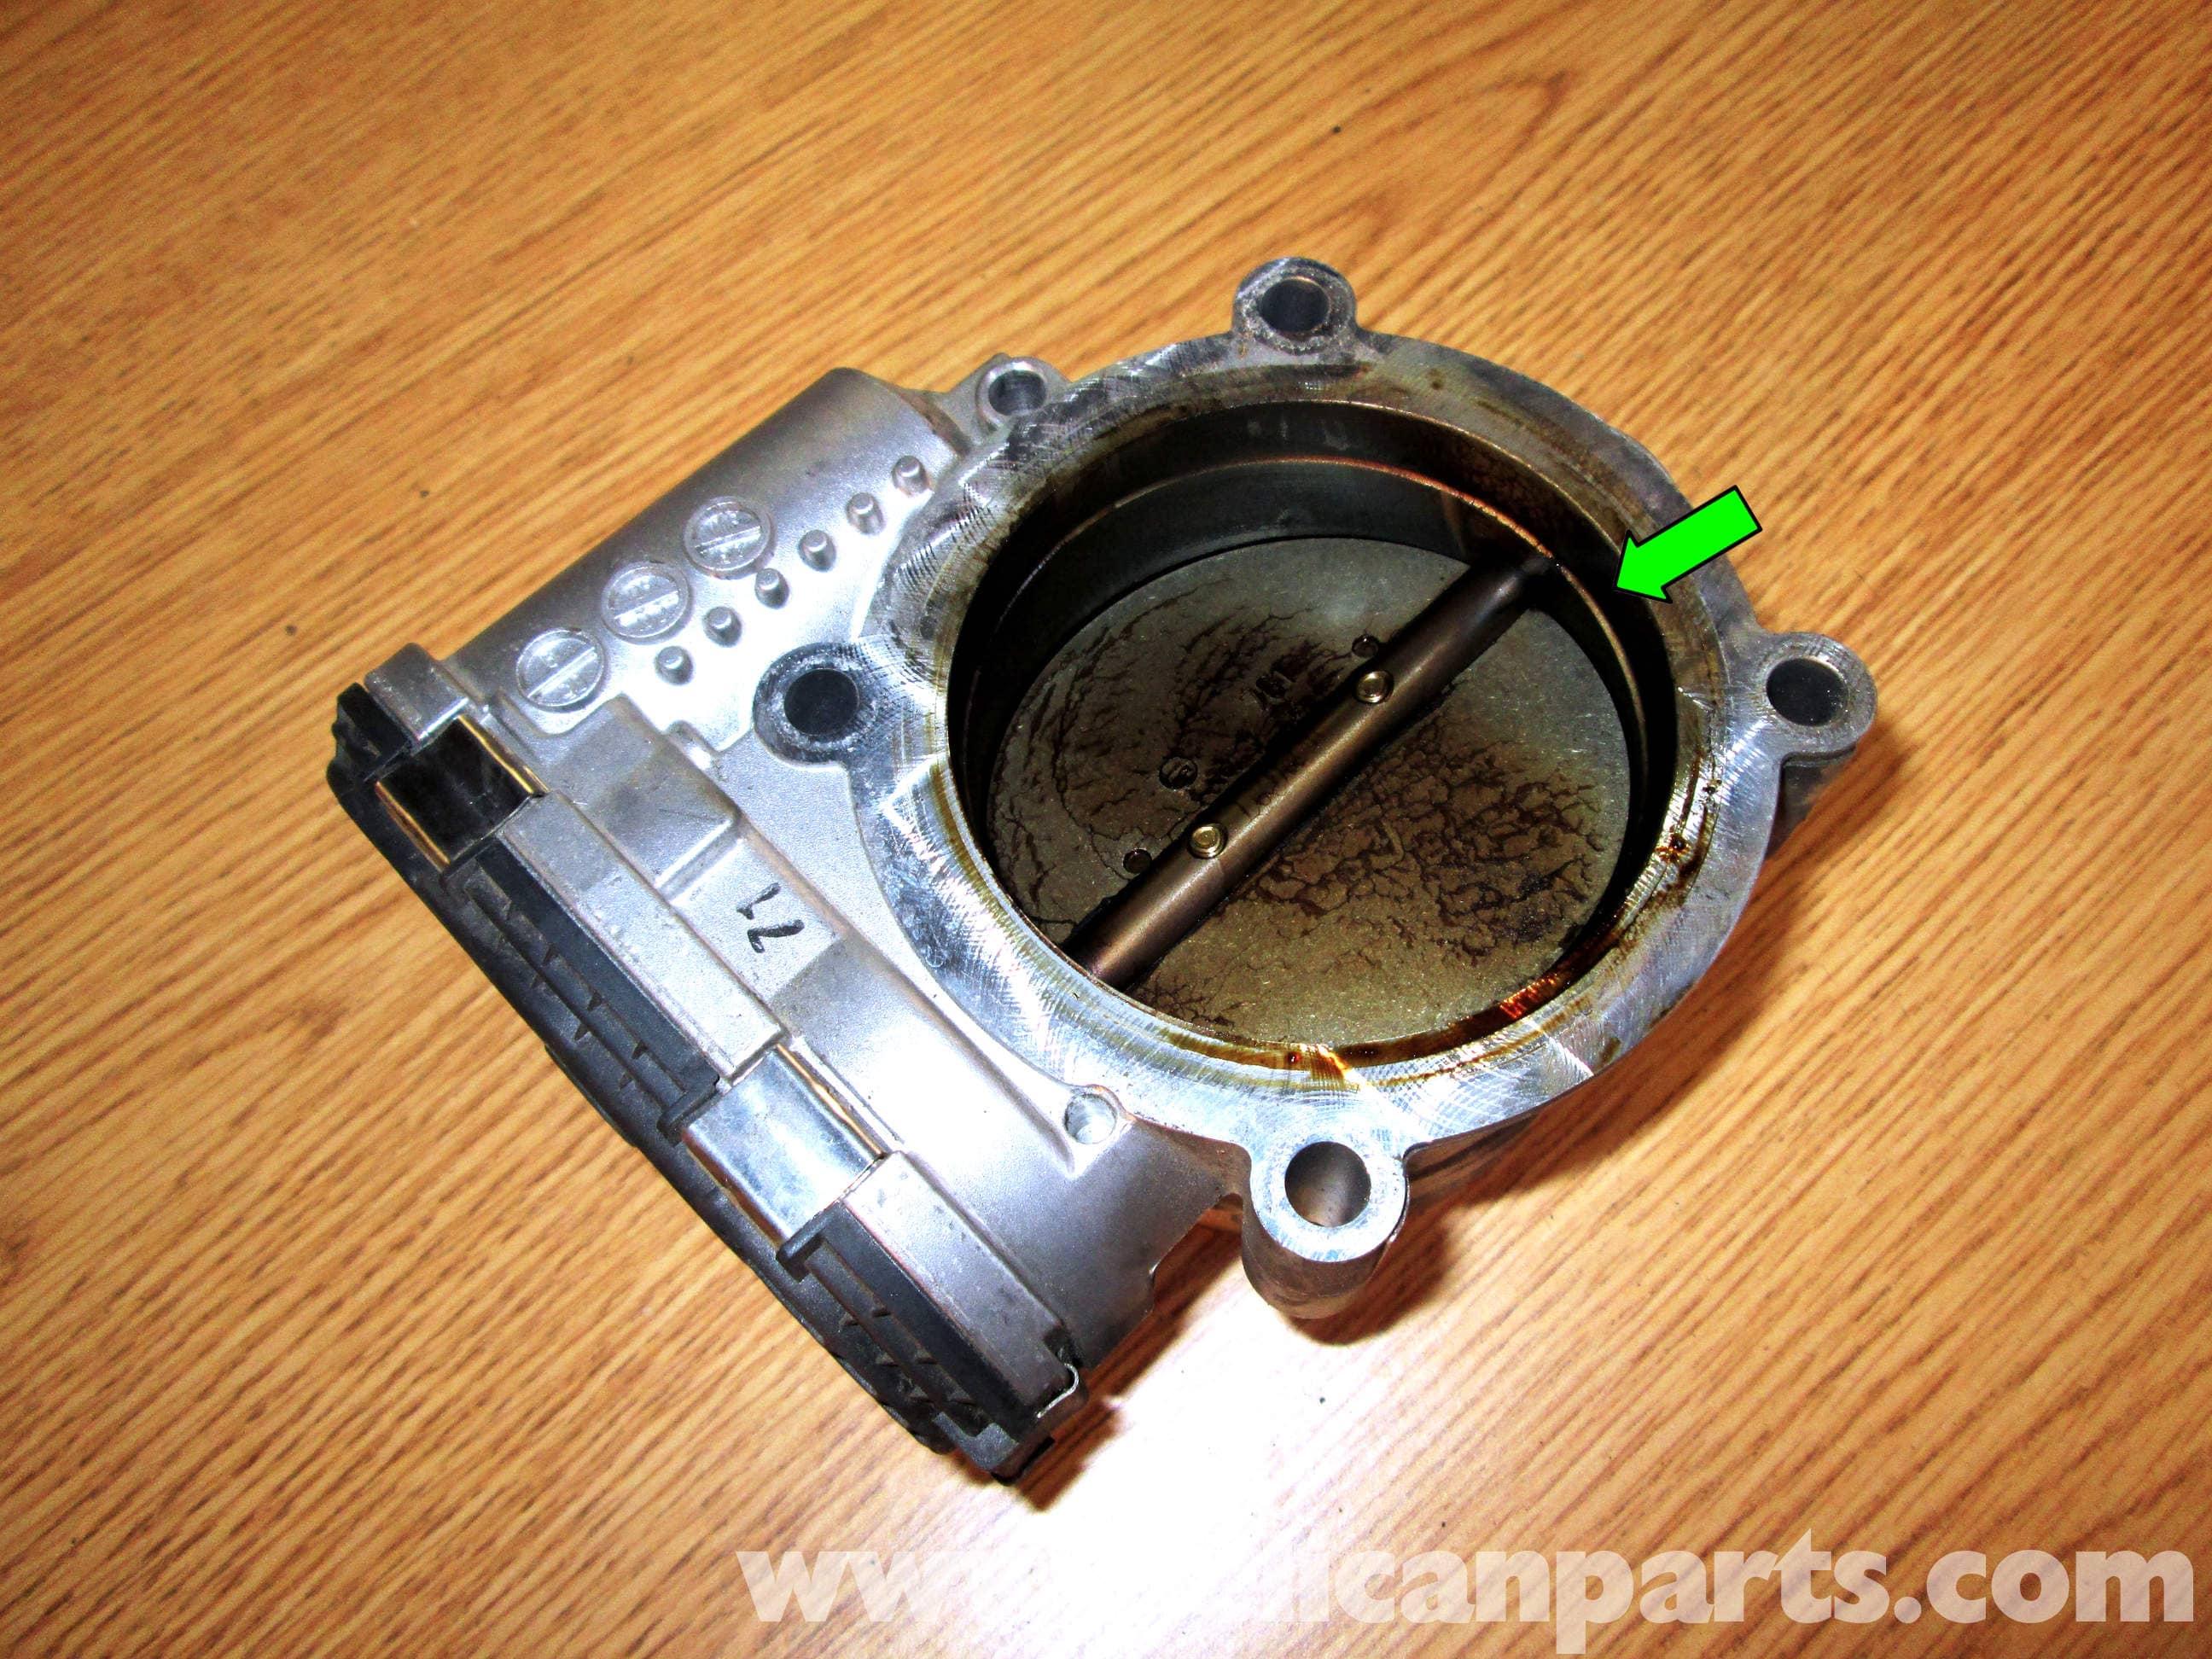 Porsche Cayenne Throttle Body Cleaning | 2003-2008 | Pelican